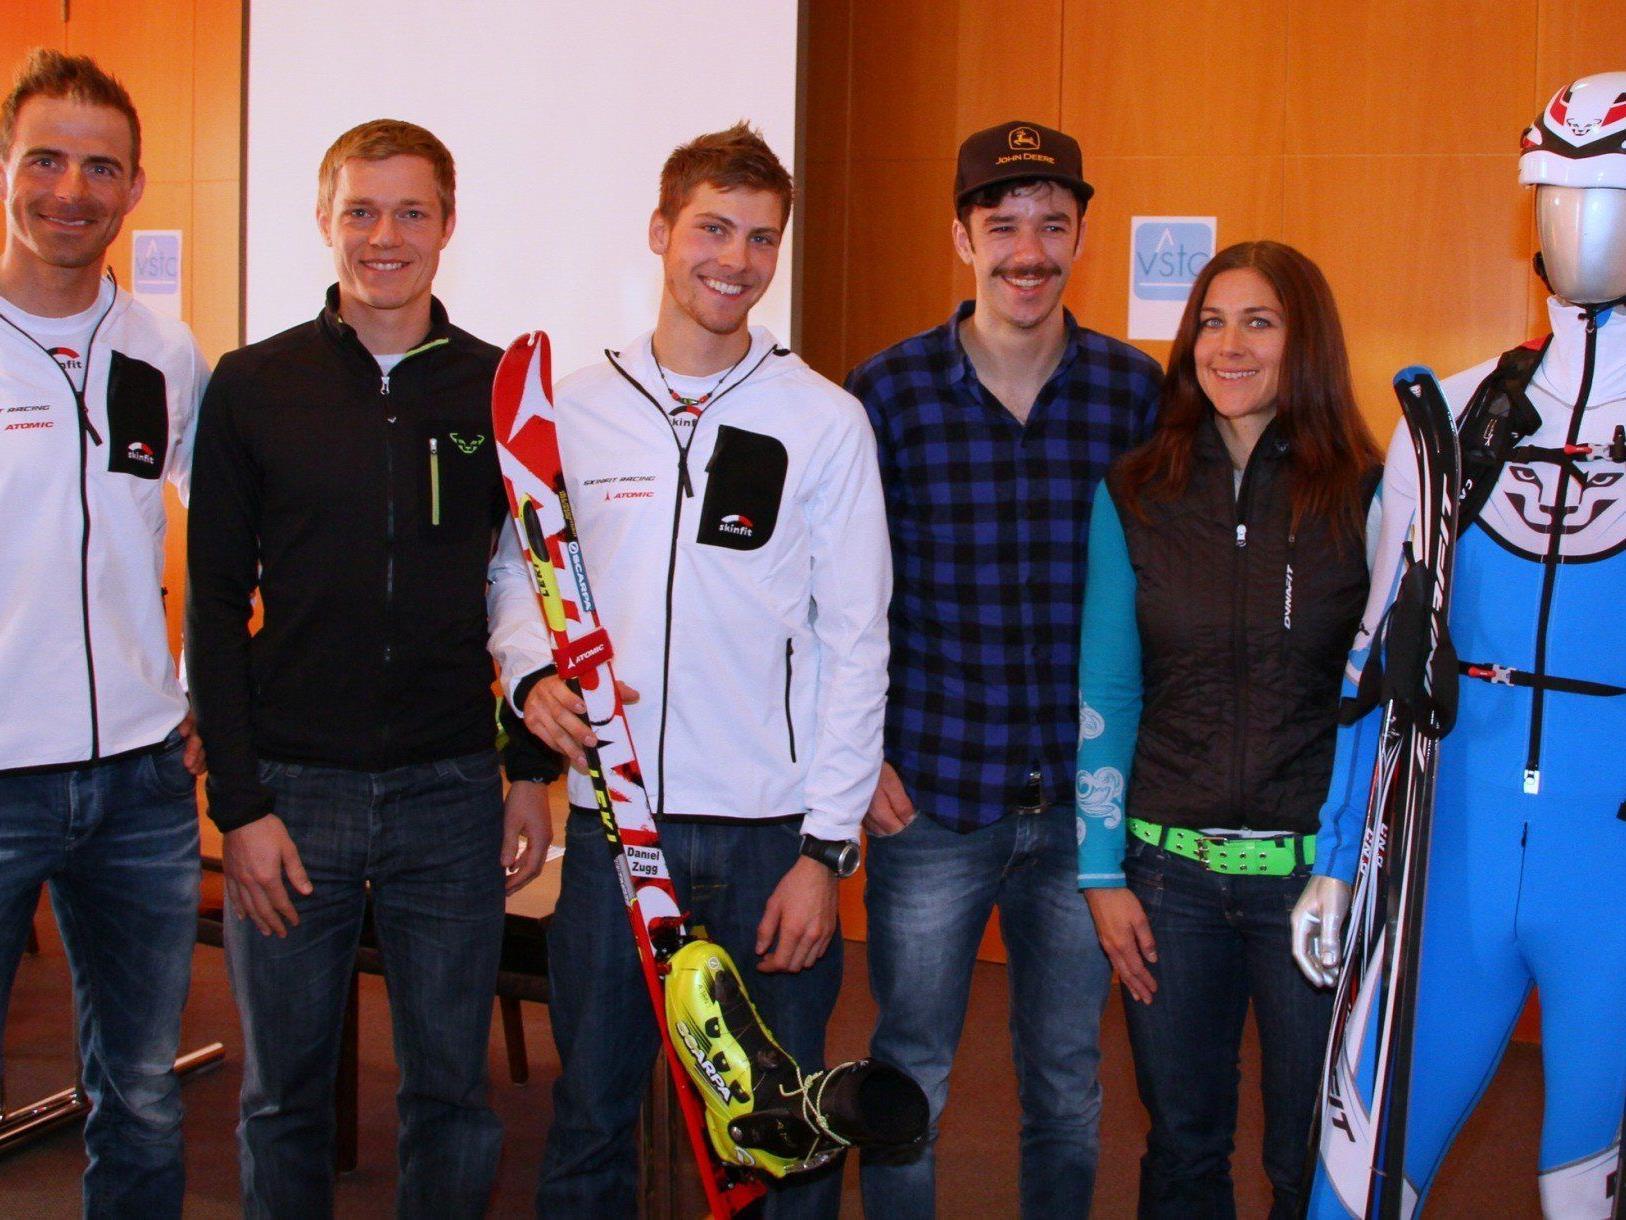 Die fünf Topathleten im Skibergsteigen: Michaela Feurle, Daniel Zugg, Johannes Graf, Patrick Innerhofer, Martin Hämmerle.